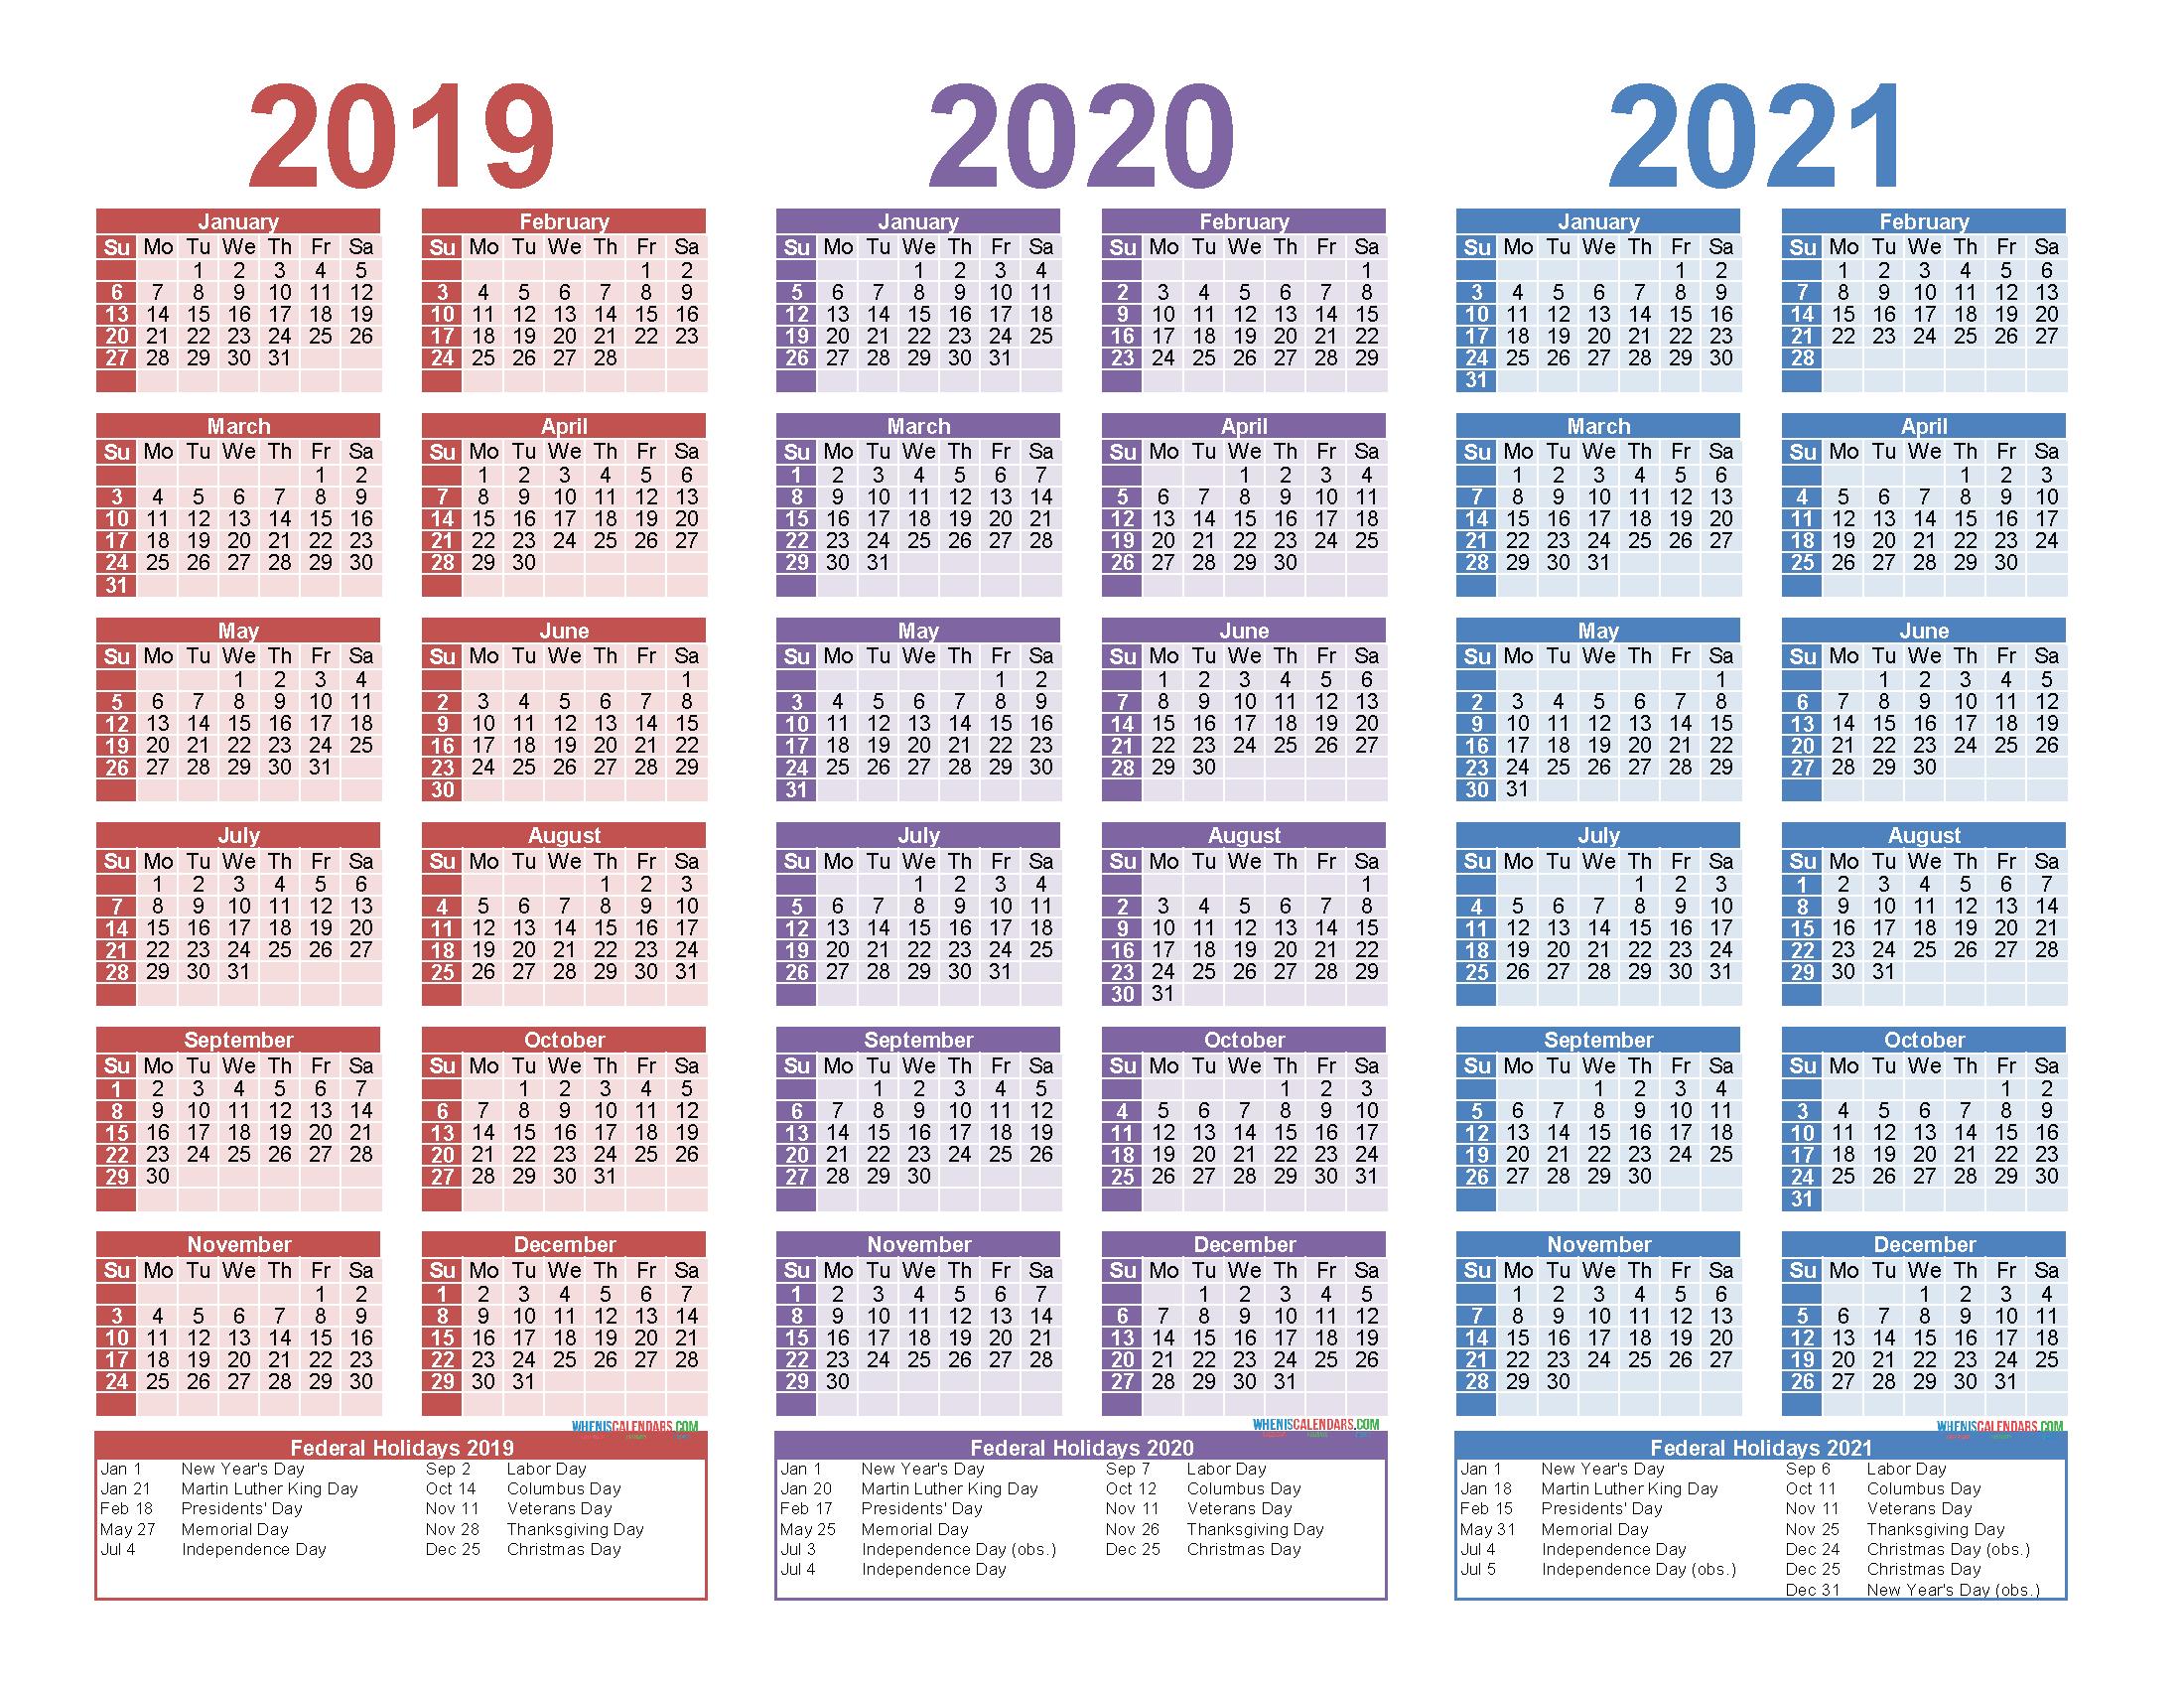 Free Printable 2019 2020 2021 Calendar With Holidays | Free